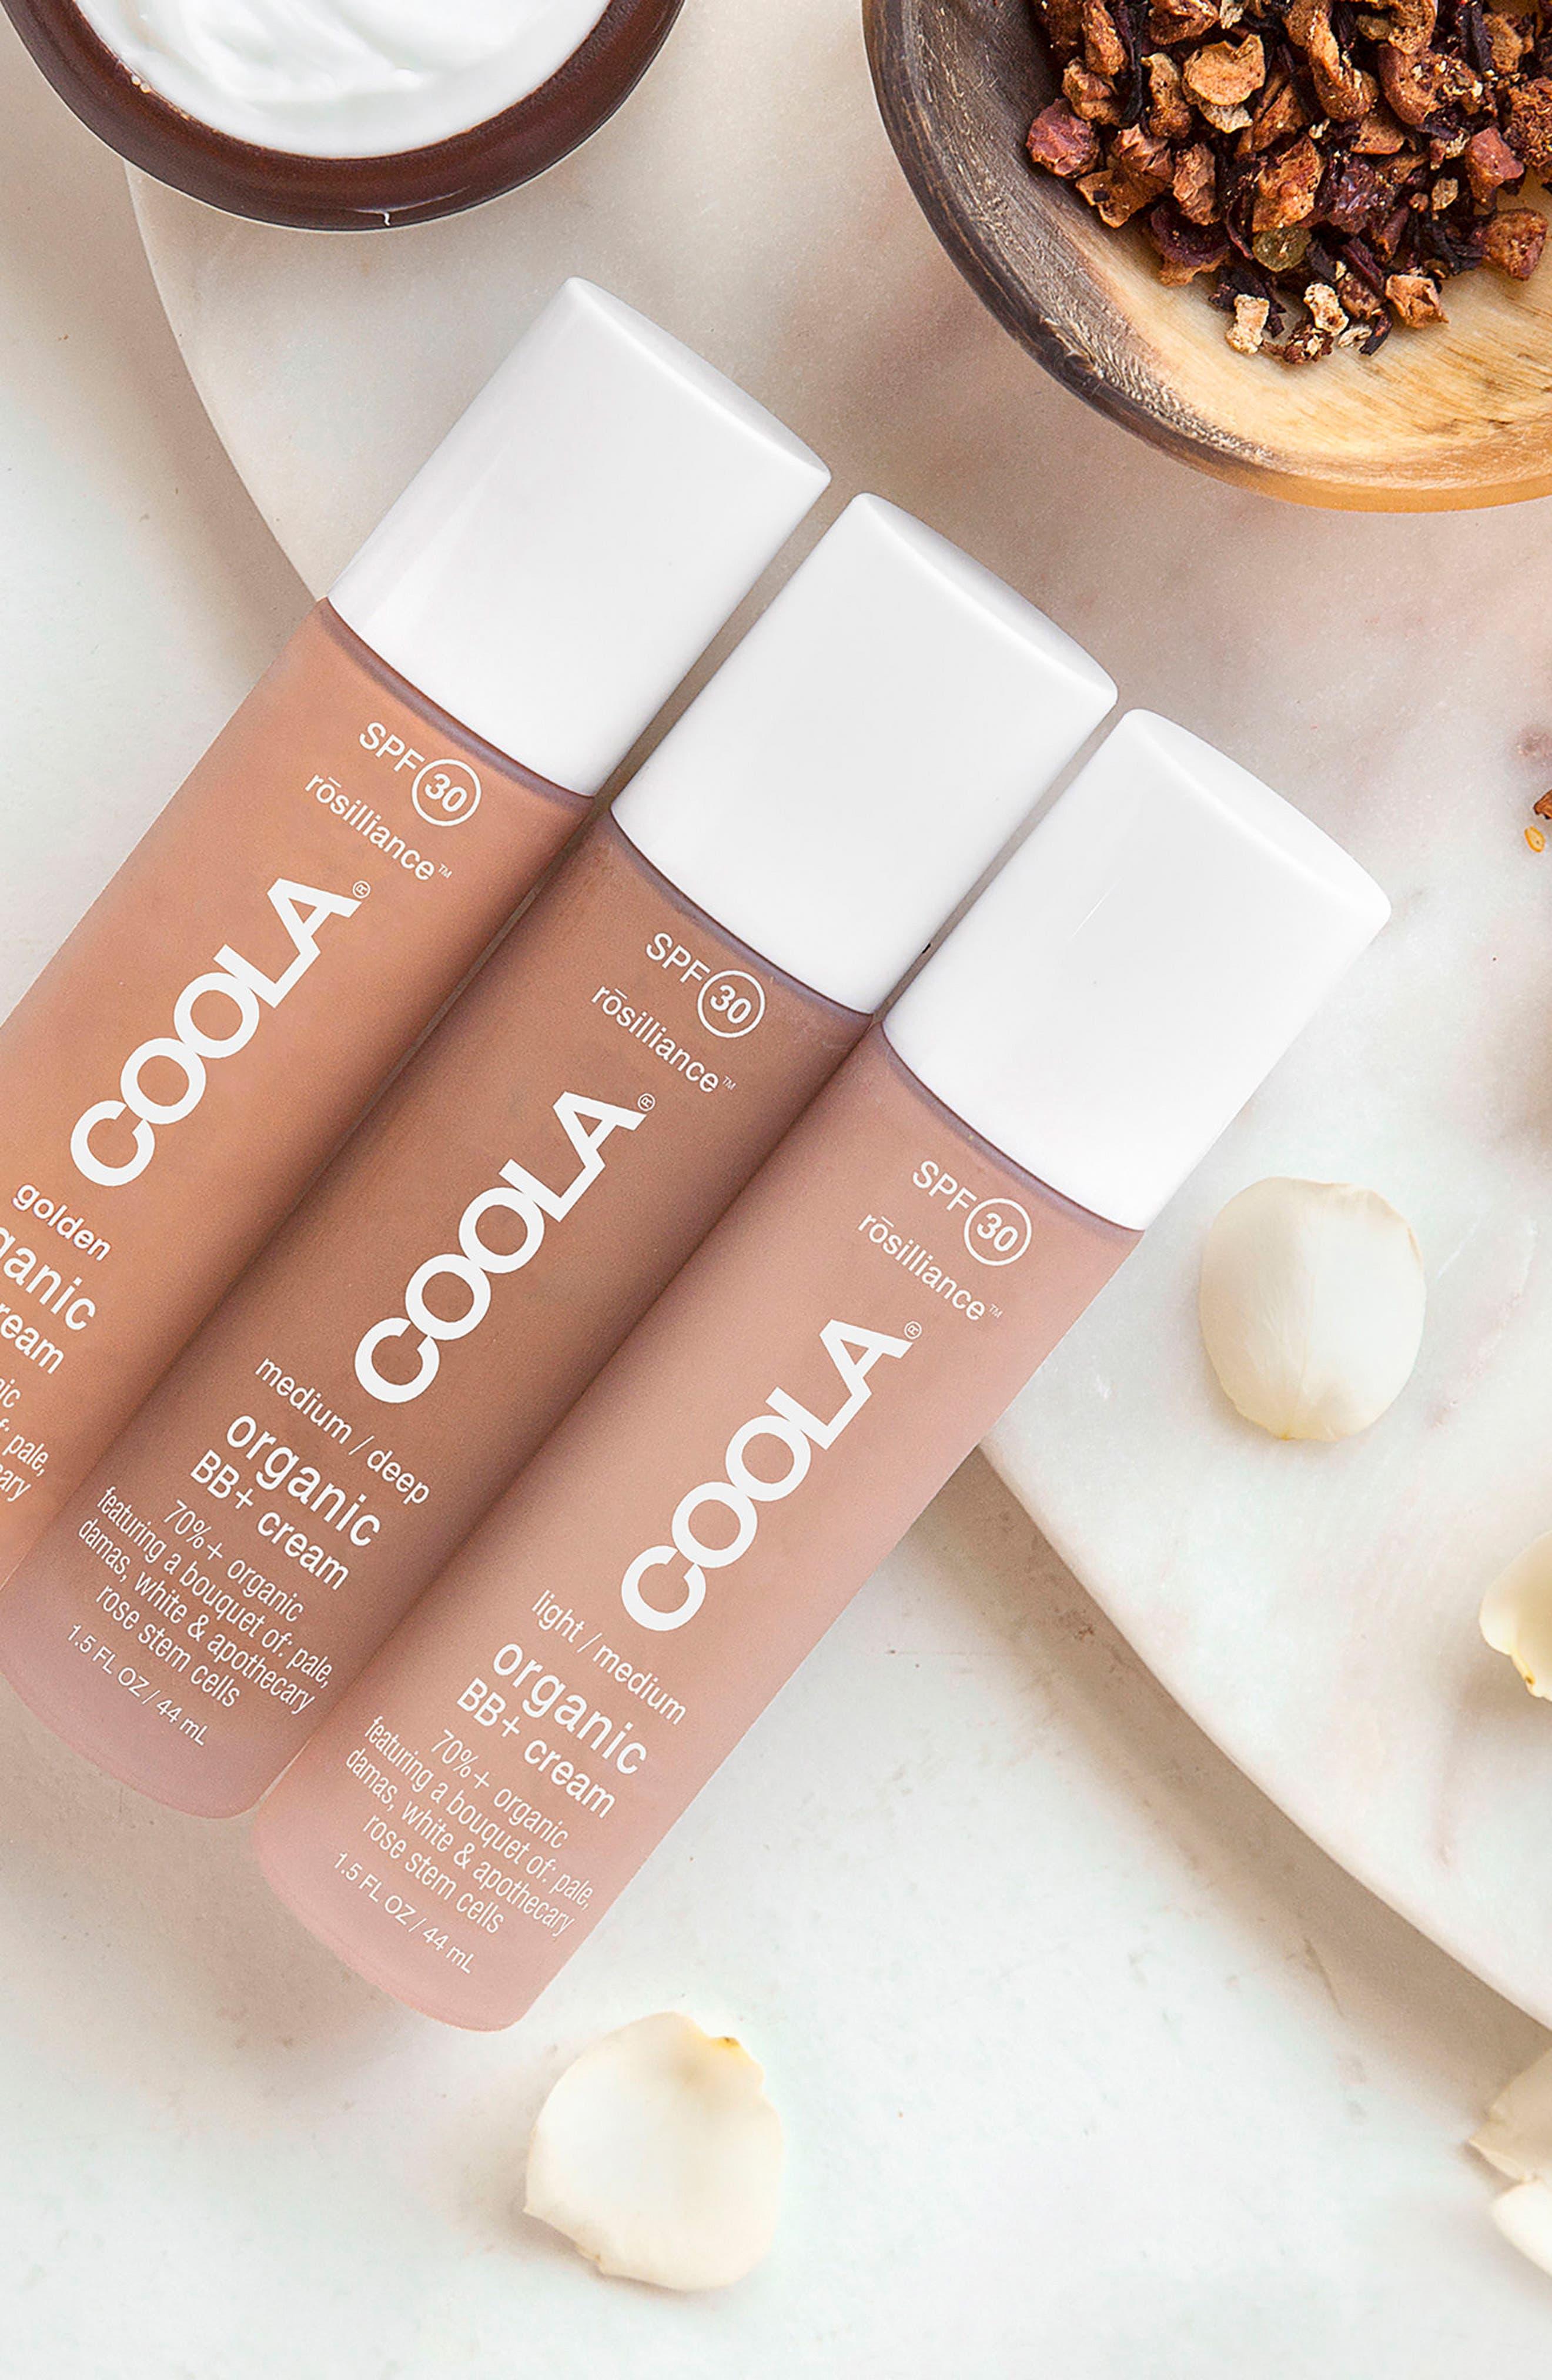 COOLA<sup>®</sup> Suncare rosilliance<sup>™</sup> Mineral BB+ Cream SPF 30,                             Alternate thumbnail 3, color,                             Medium Dark